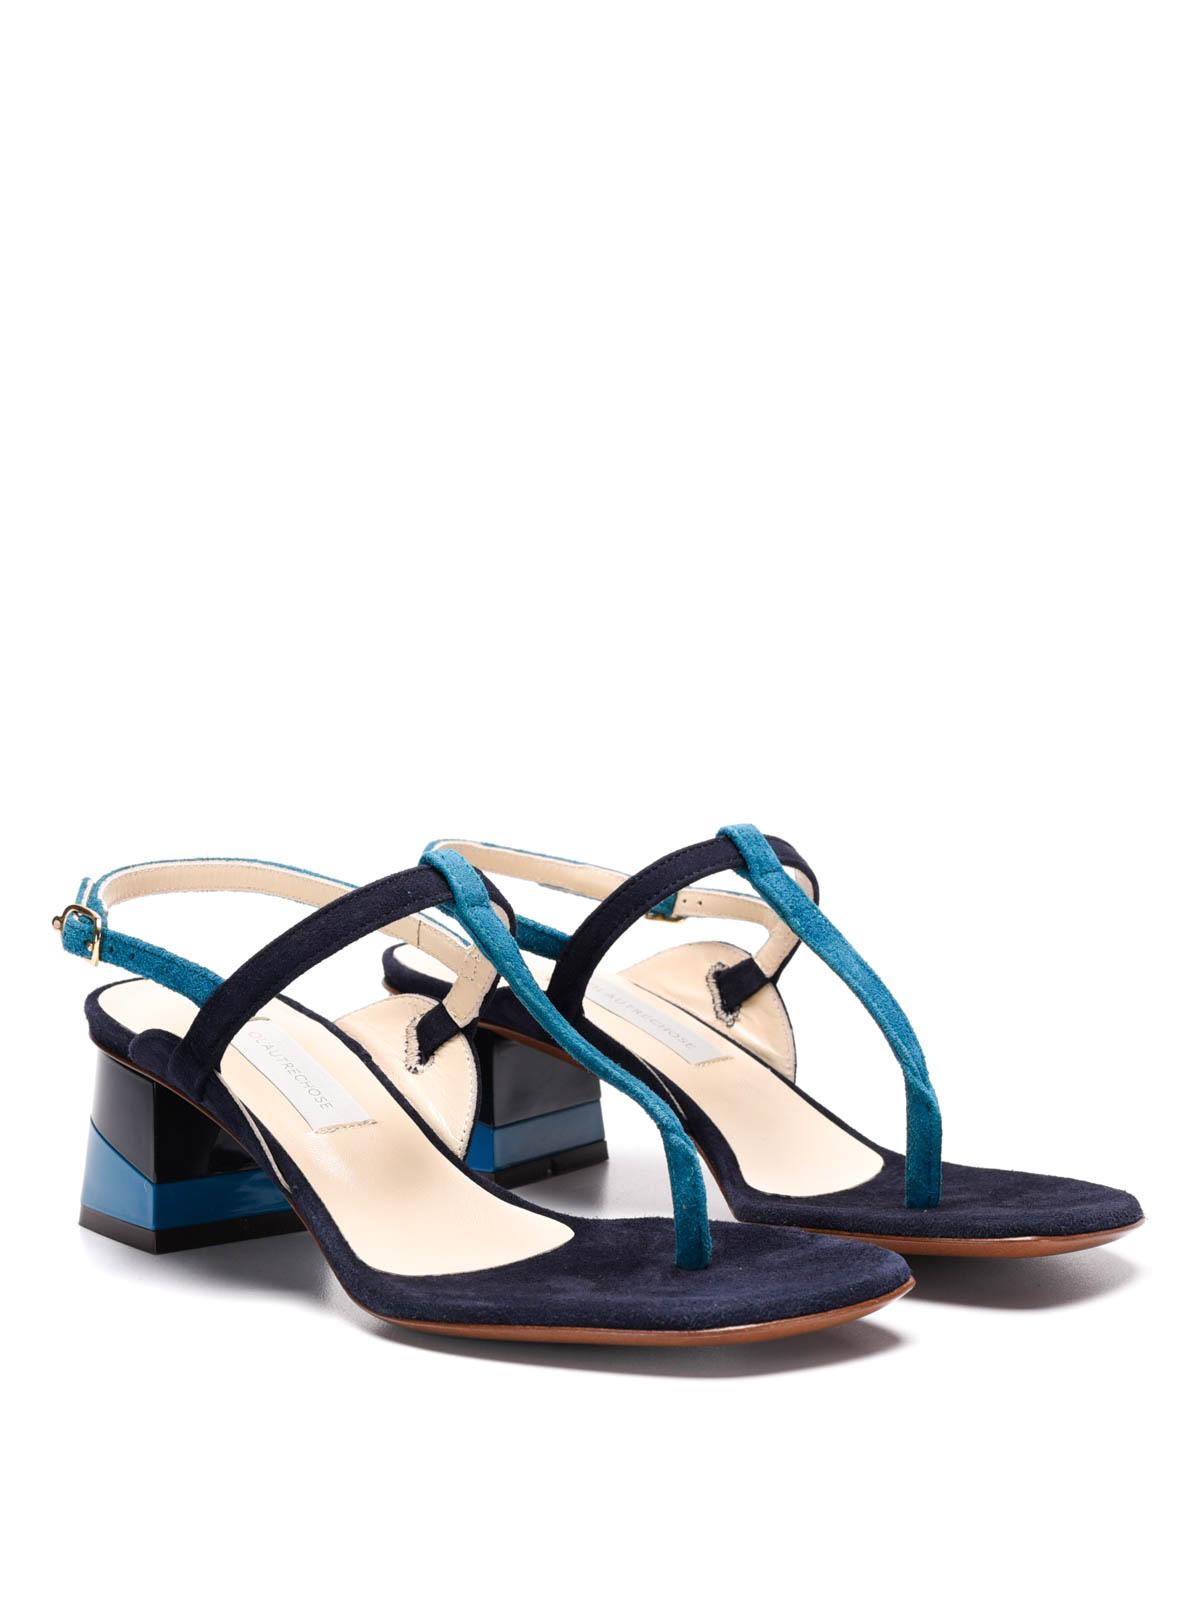 suede sandals by l 39 autre chose sandals ikrix. Black Bedroom Furniture Sets. Home Design Ideas